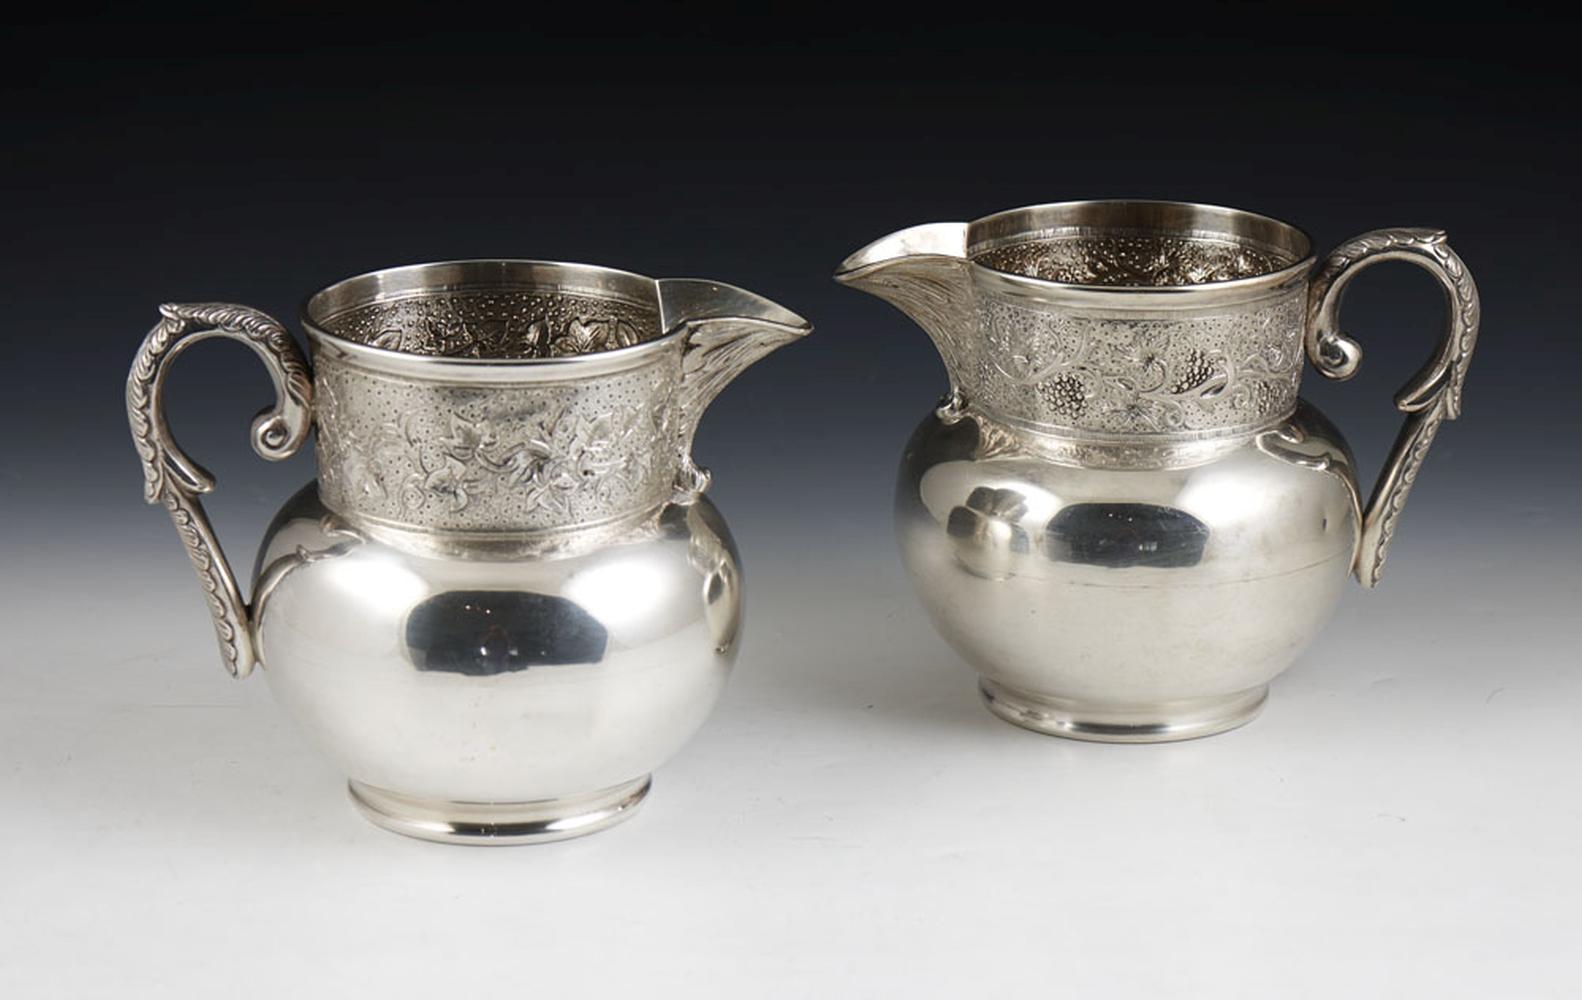 2 jarros em prata portuguesa, 833%, P: 1690 g.